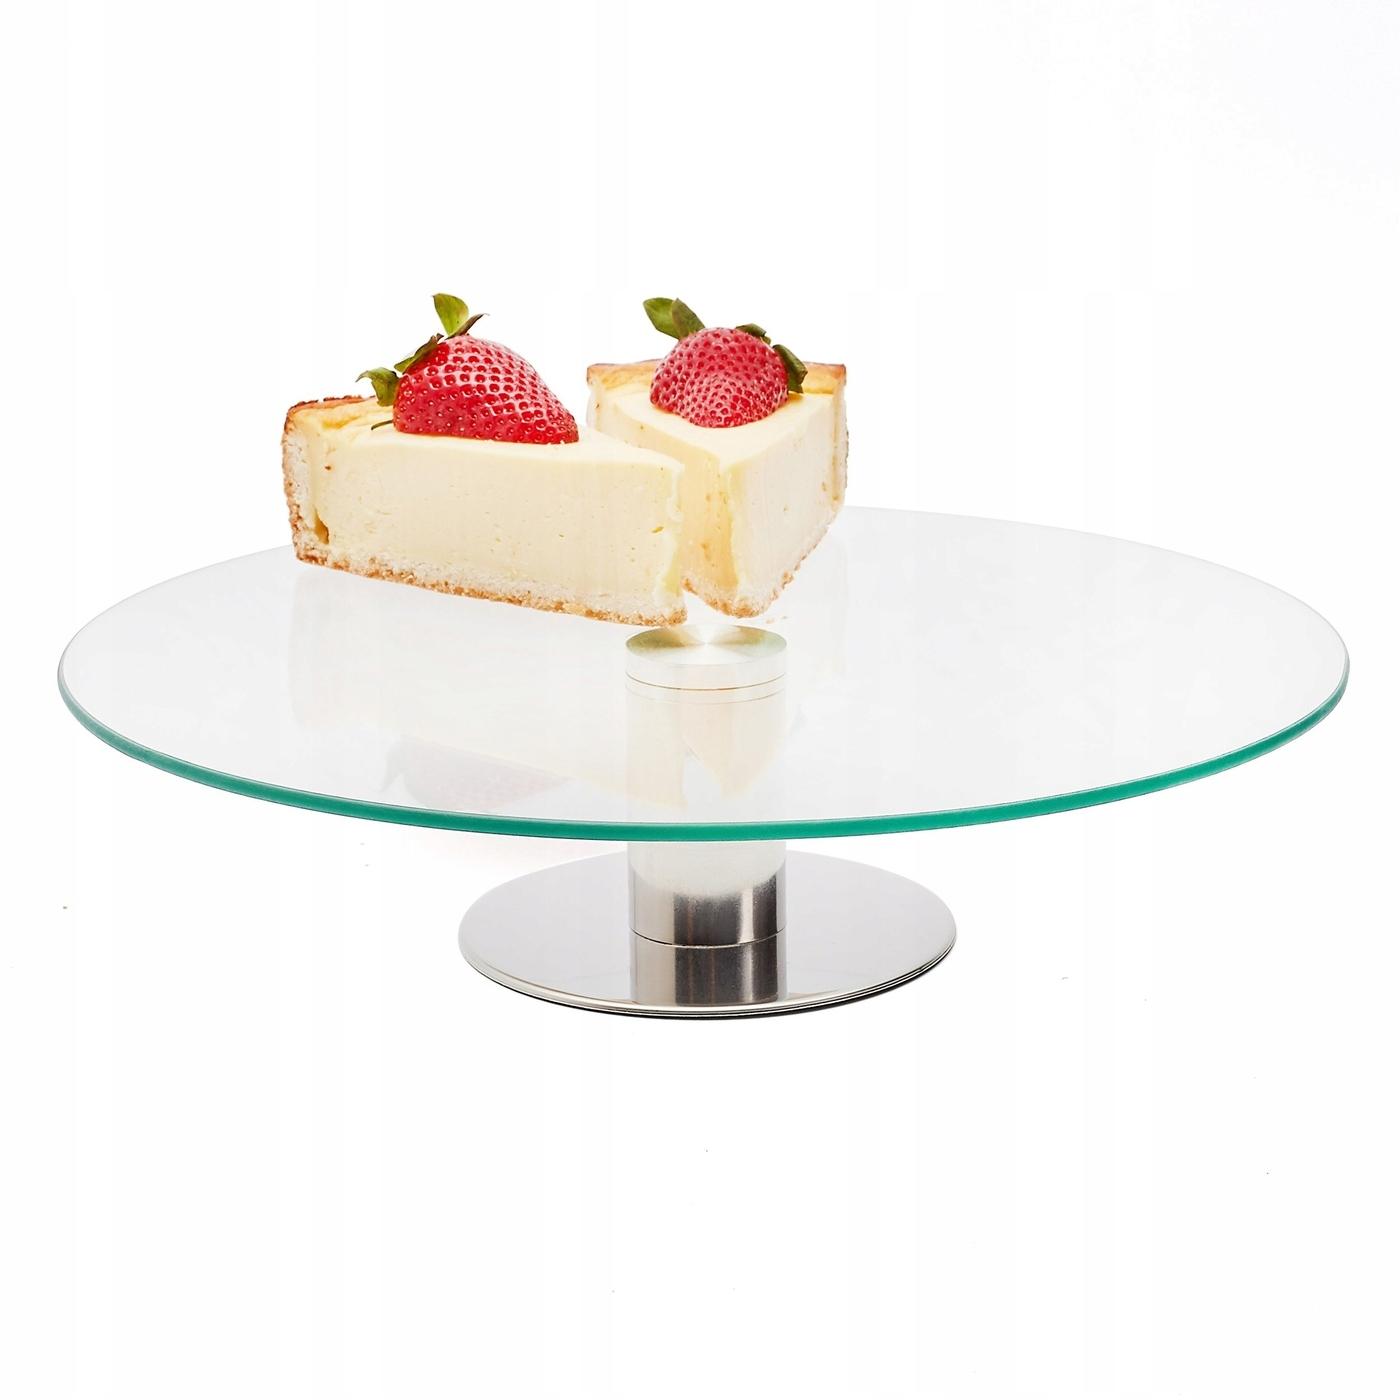 Тарелка стеклянная Tadar Omena 30 см круглая